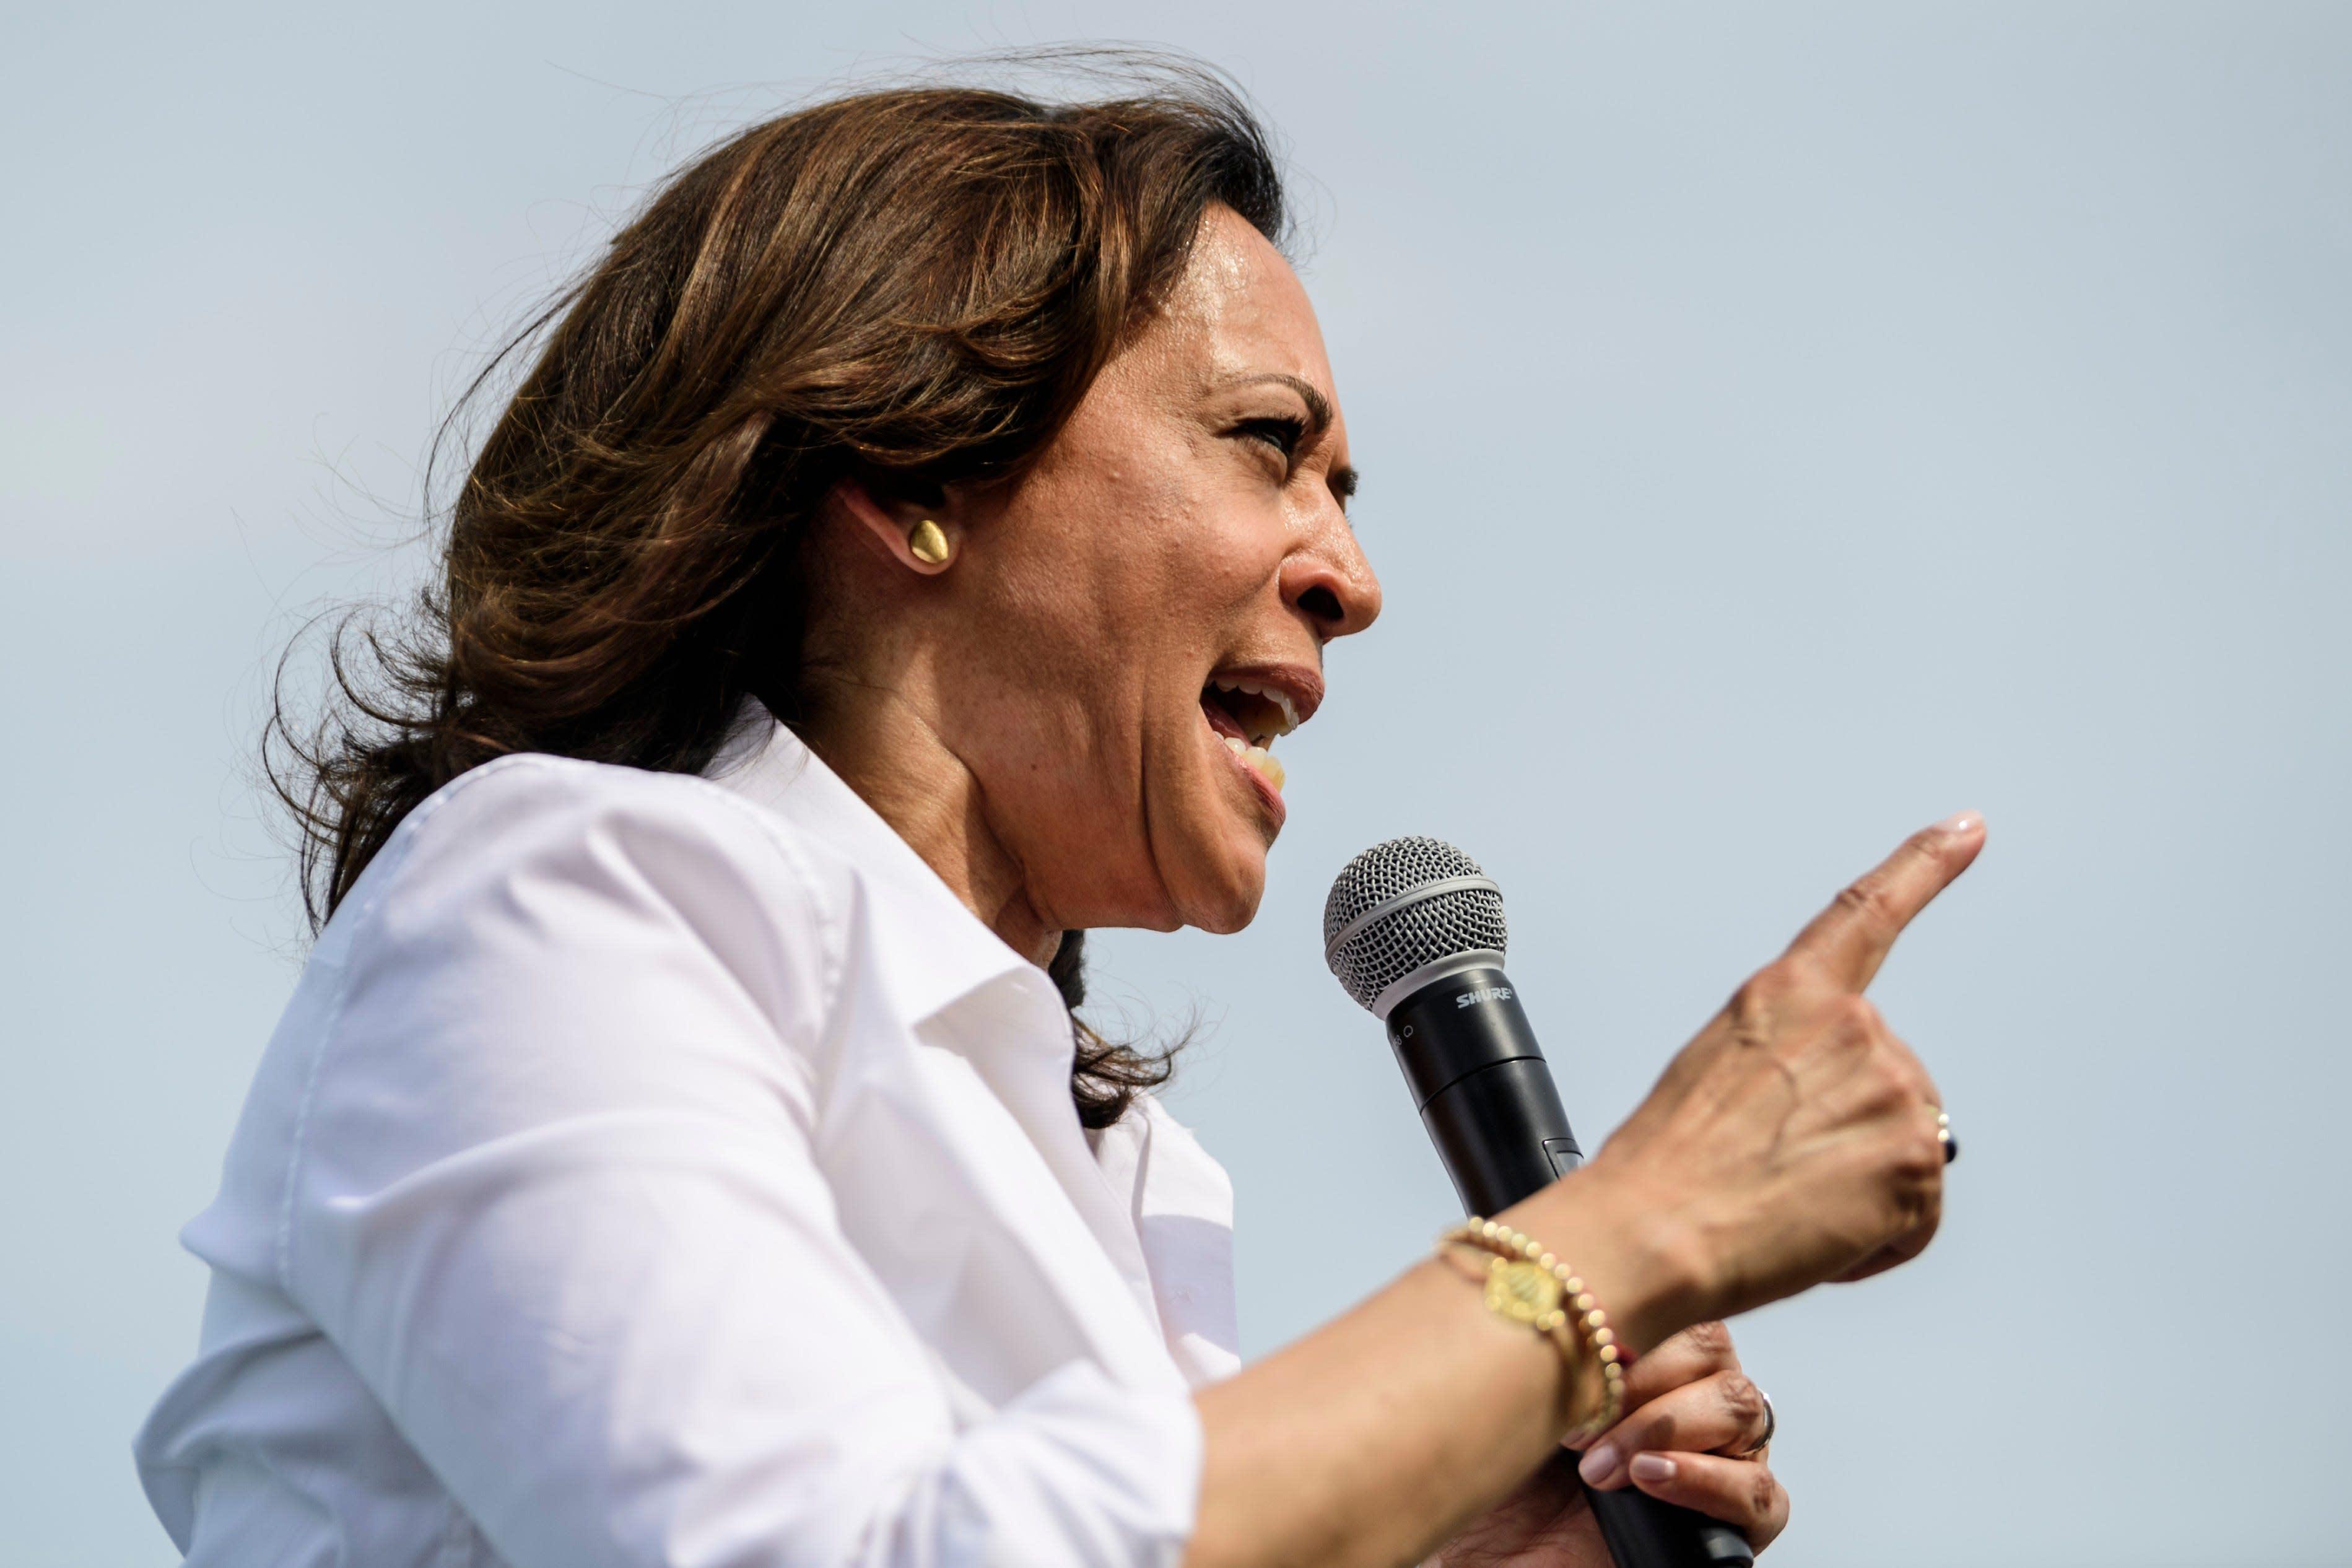 Kamala Harris hits back at NRA after group criticizes her gun control proposals